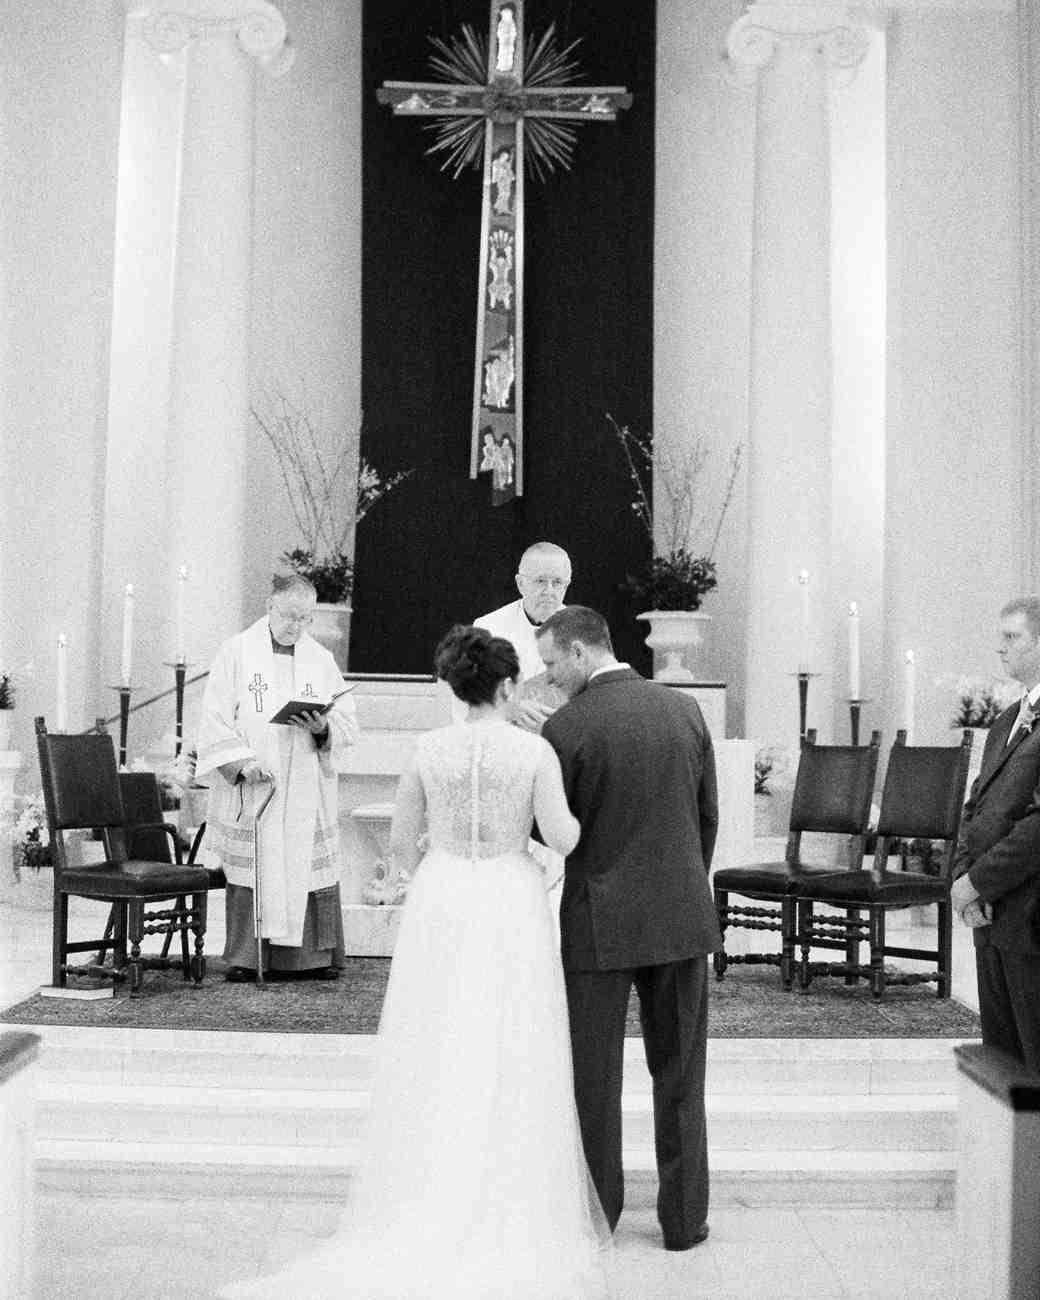 shannon-ryan-wedding-ceremony-111-s111853-0415.jpg